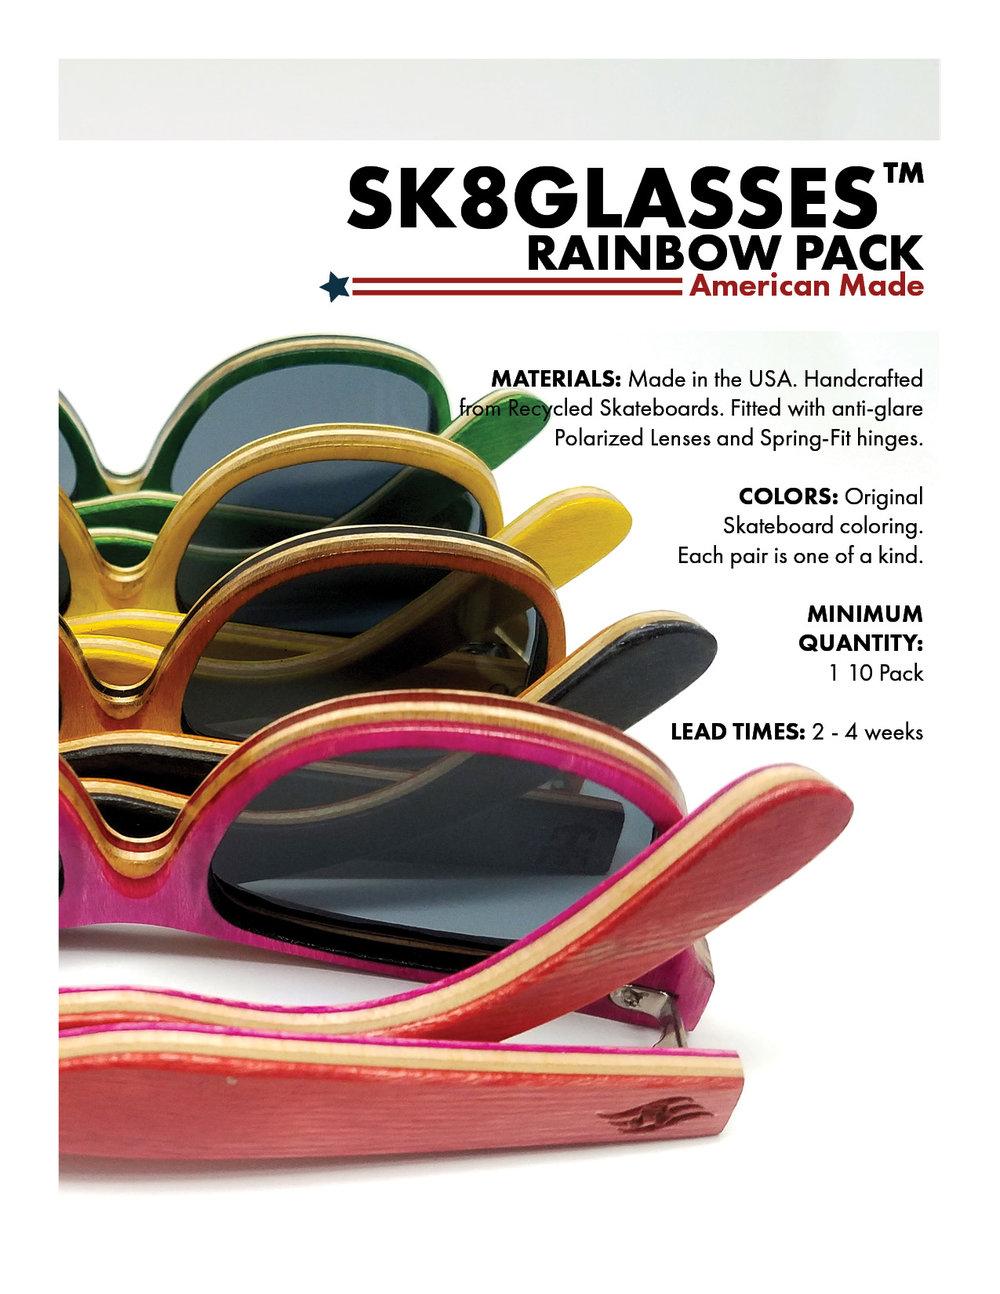 SK8Glasses™ Rainbow Pack